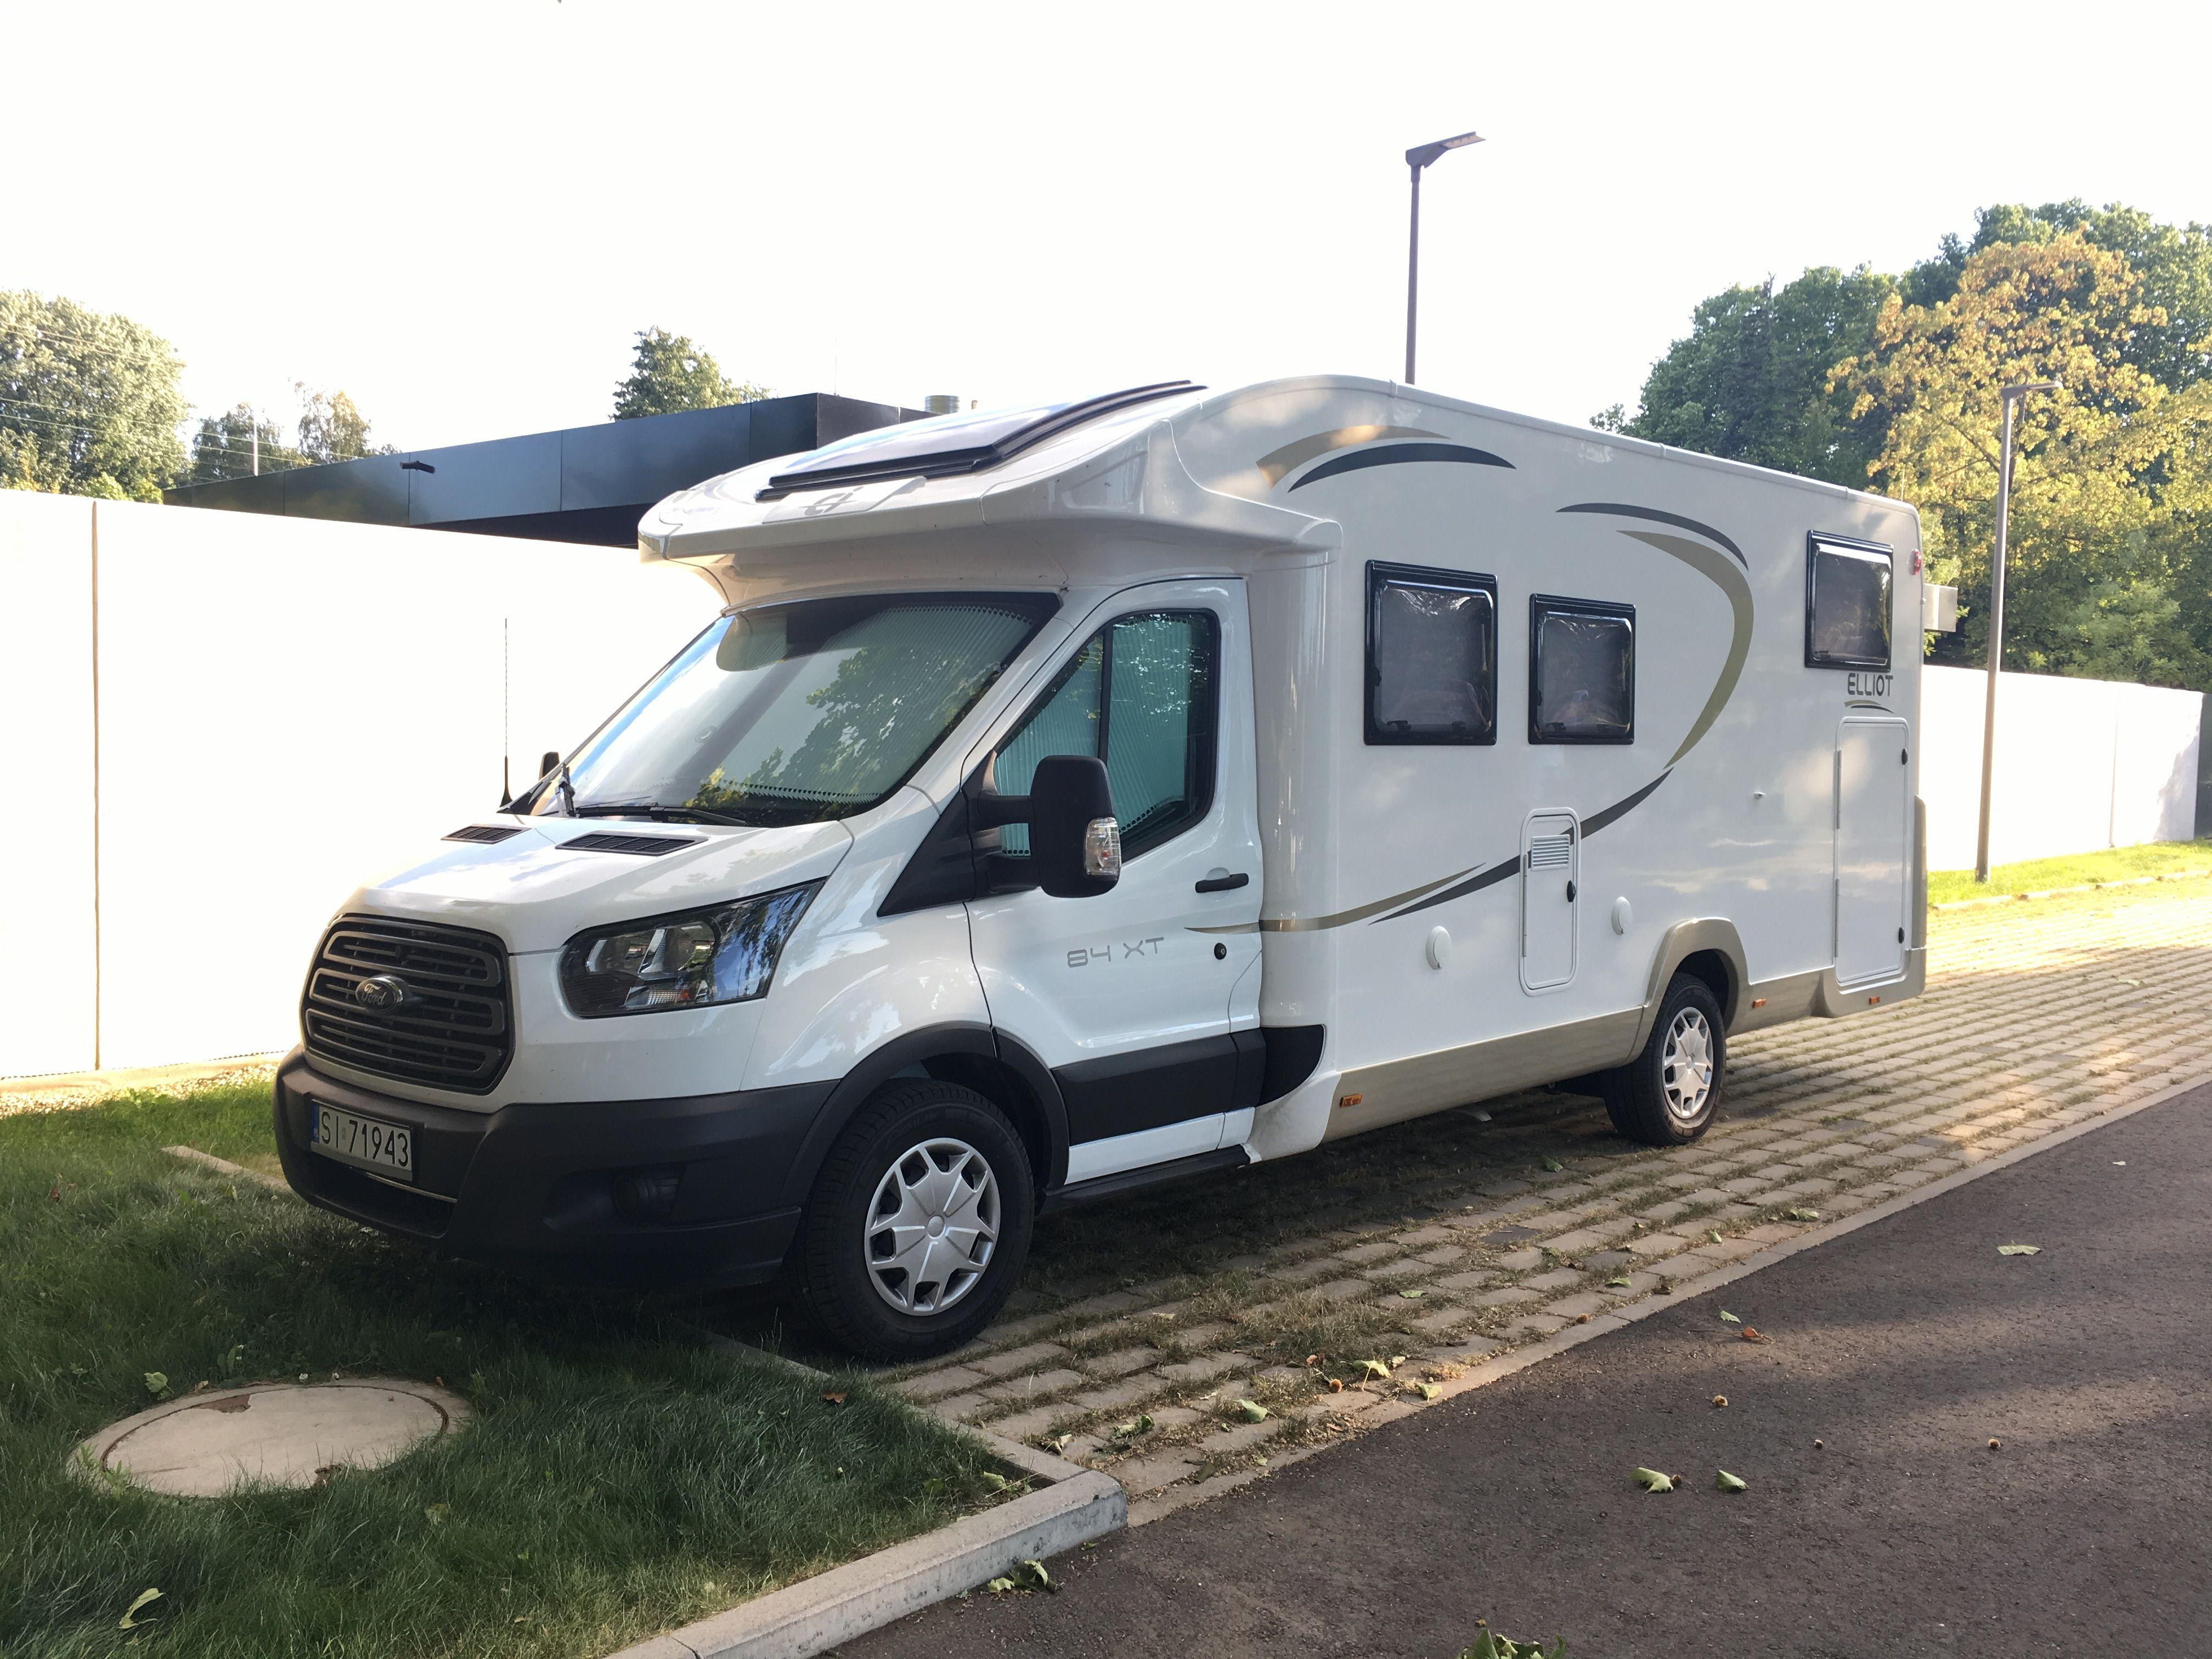 CI ELLIOT 10XT FORD Camper, kamper, wohnmobil, RV Camp&Truck